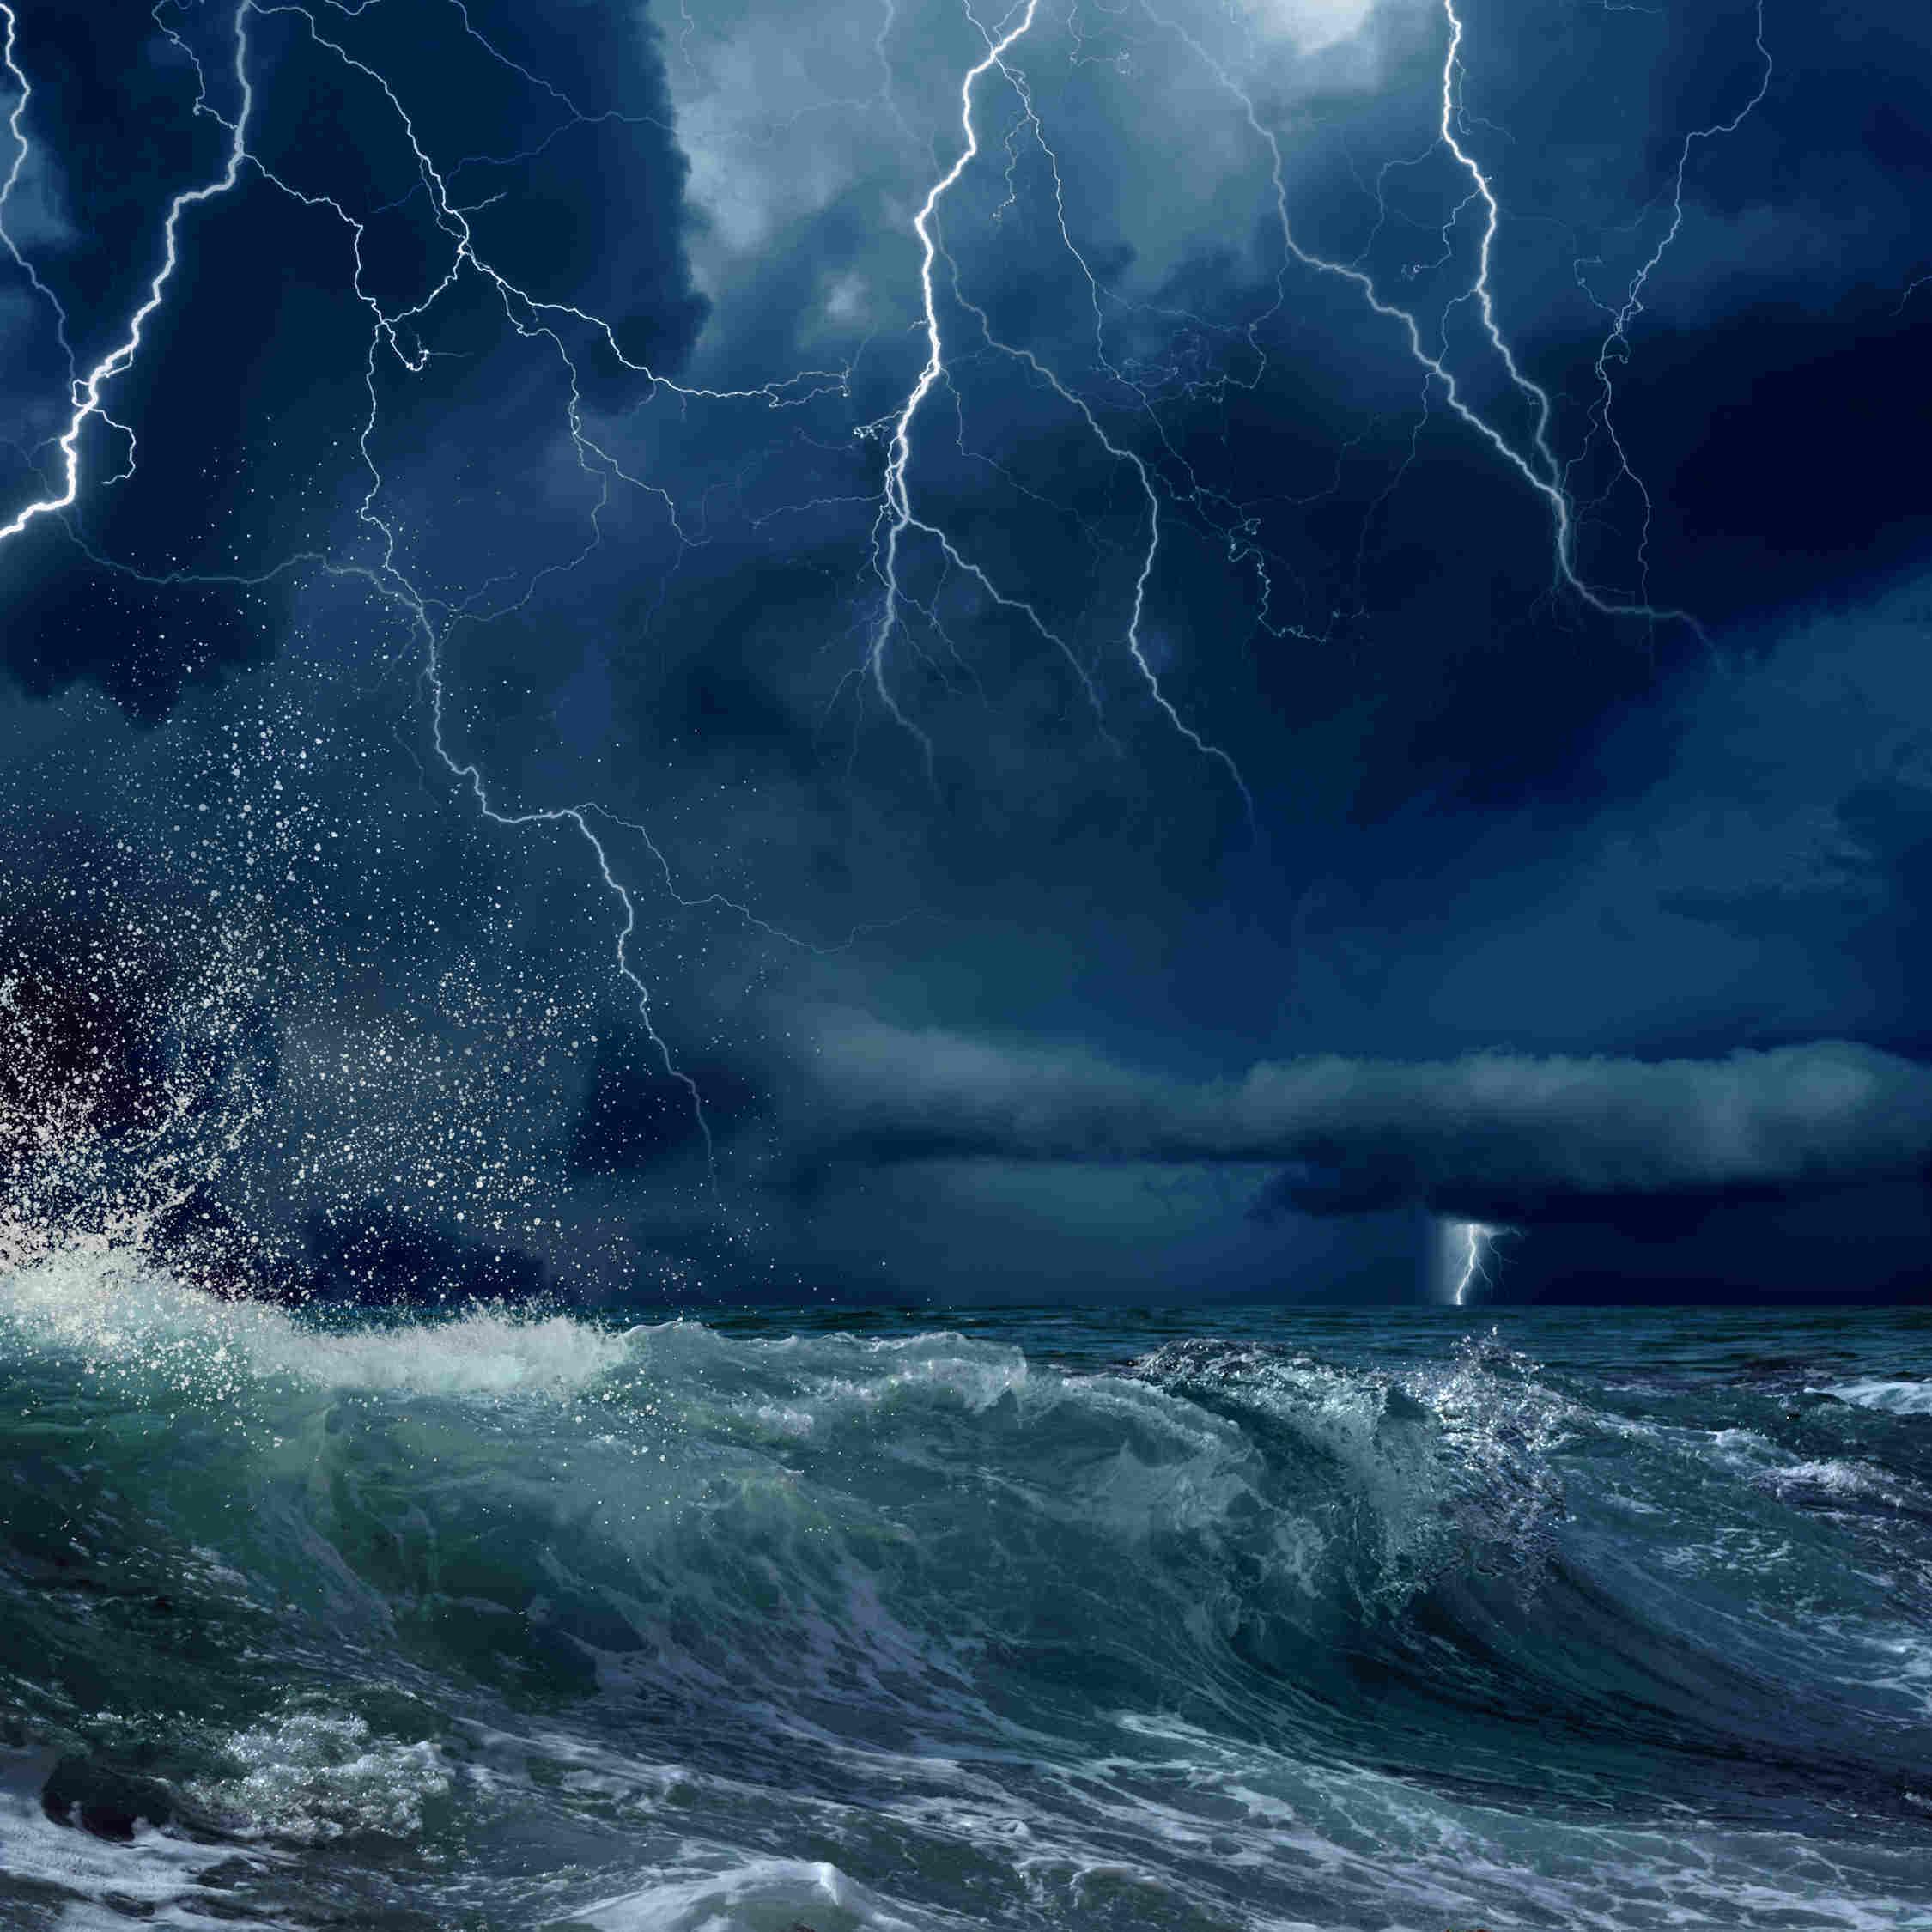 Stormy seas with lightening and rain